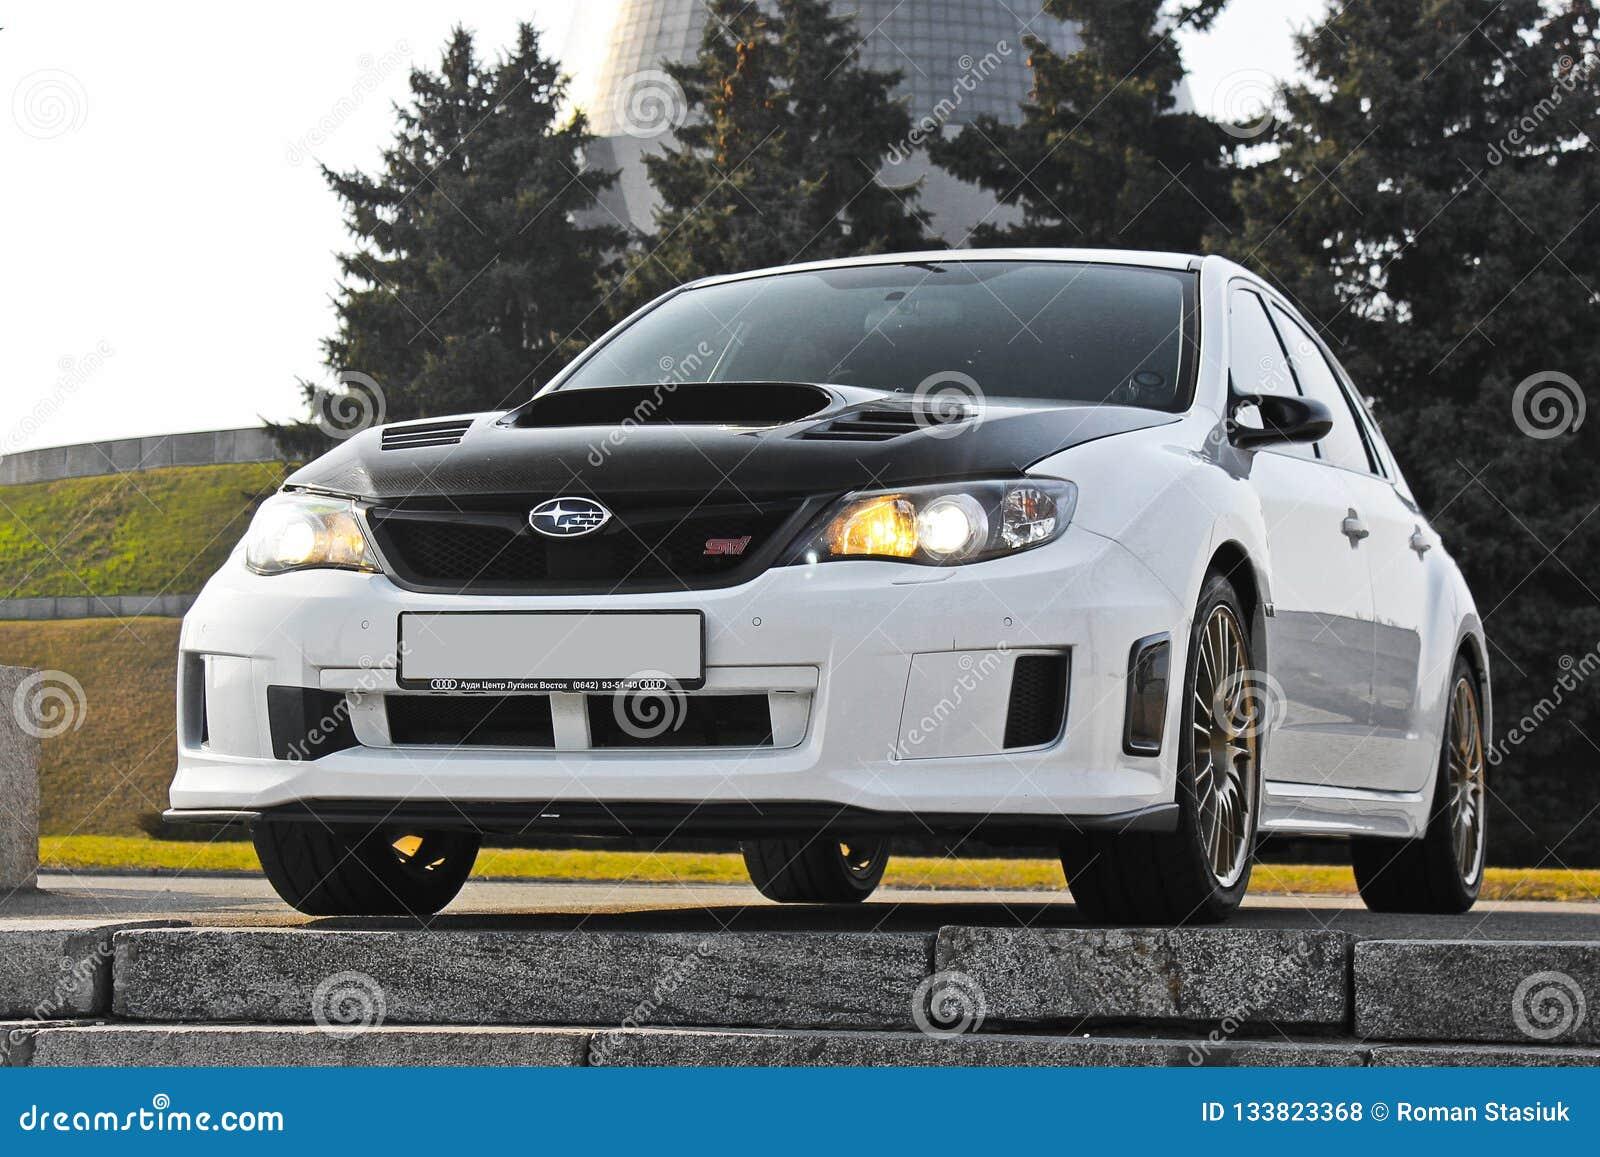 Kiev, Ucraina; 20 gennaio 2014 STI di Subaru Impreza WRX